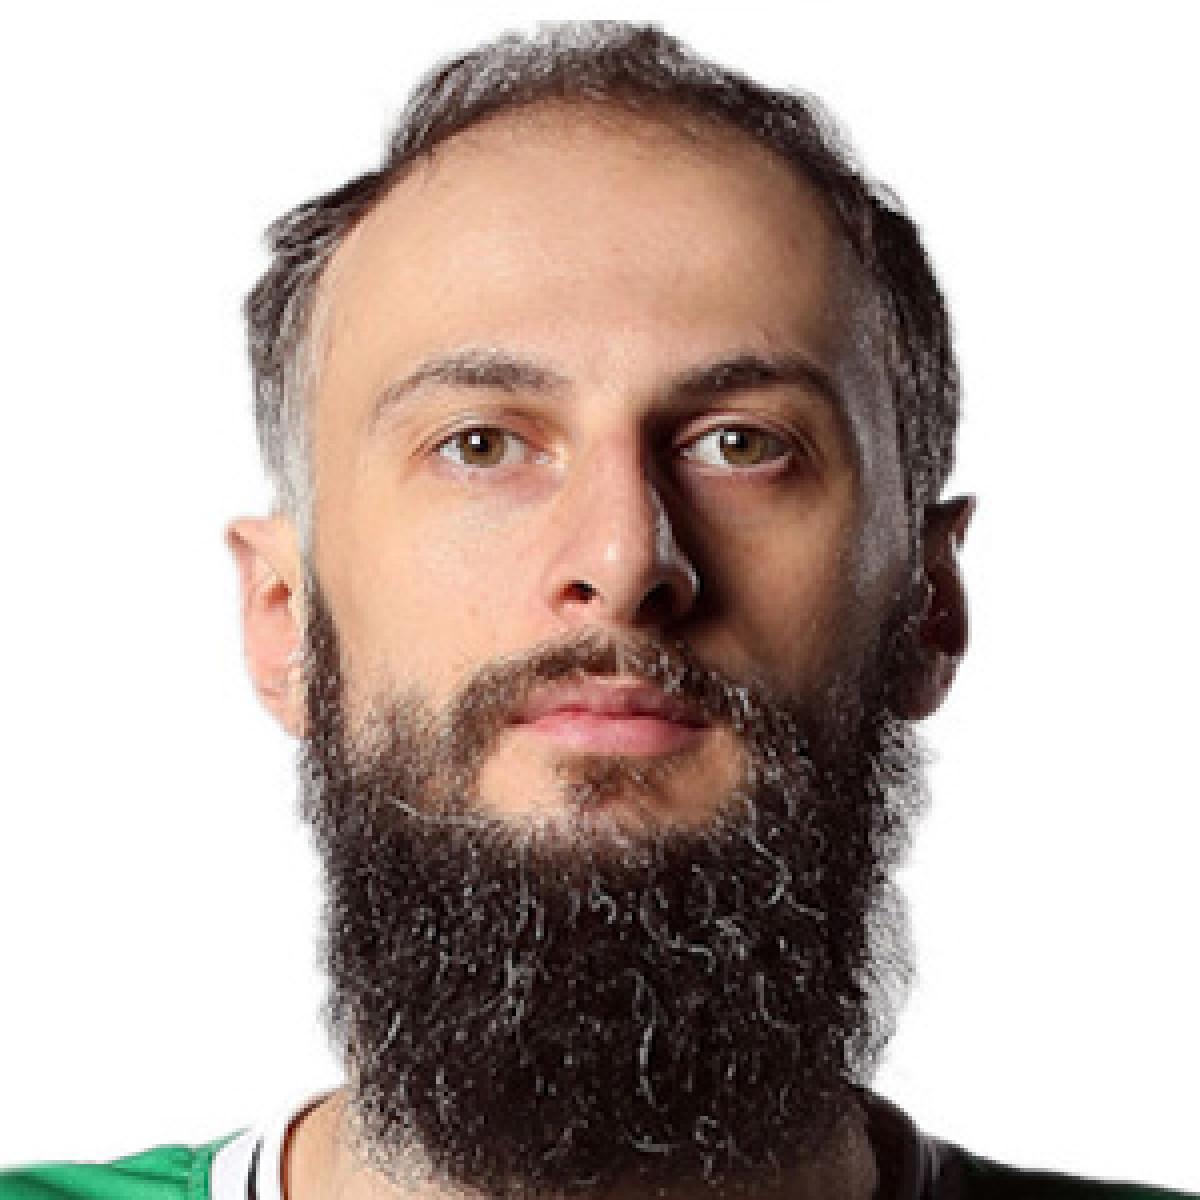 Viktor Sanikidze